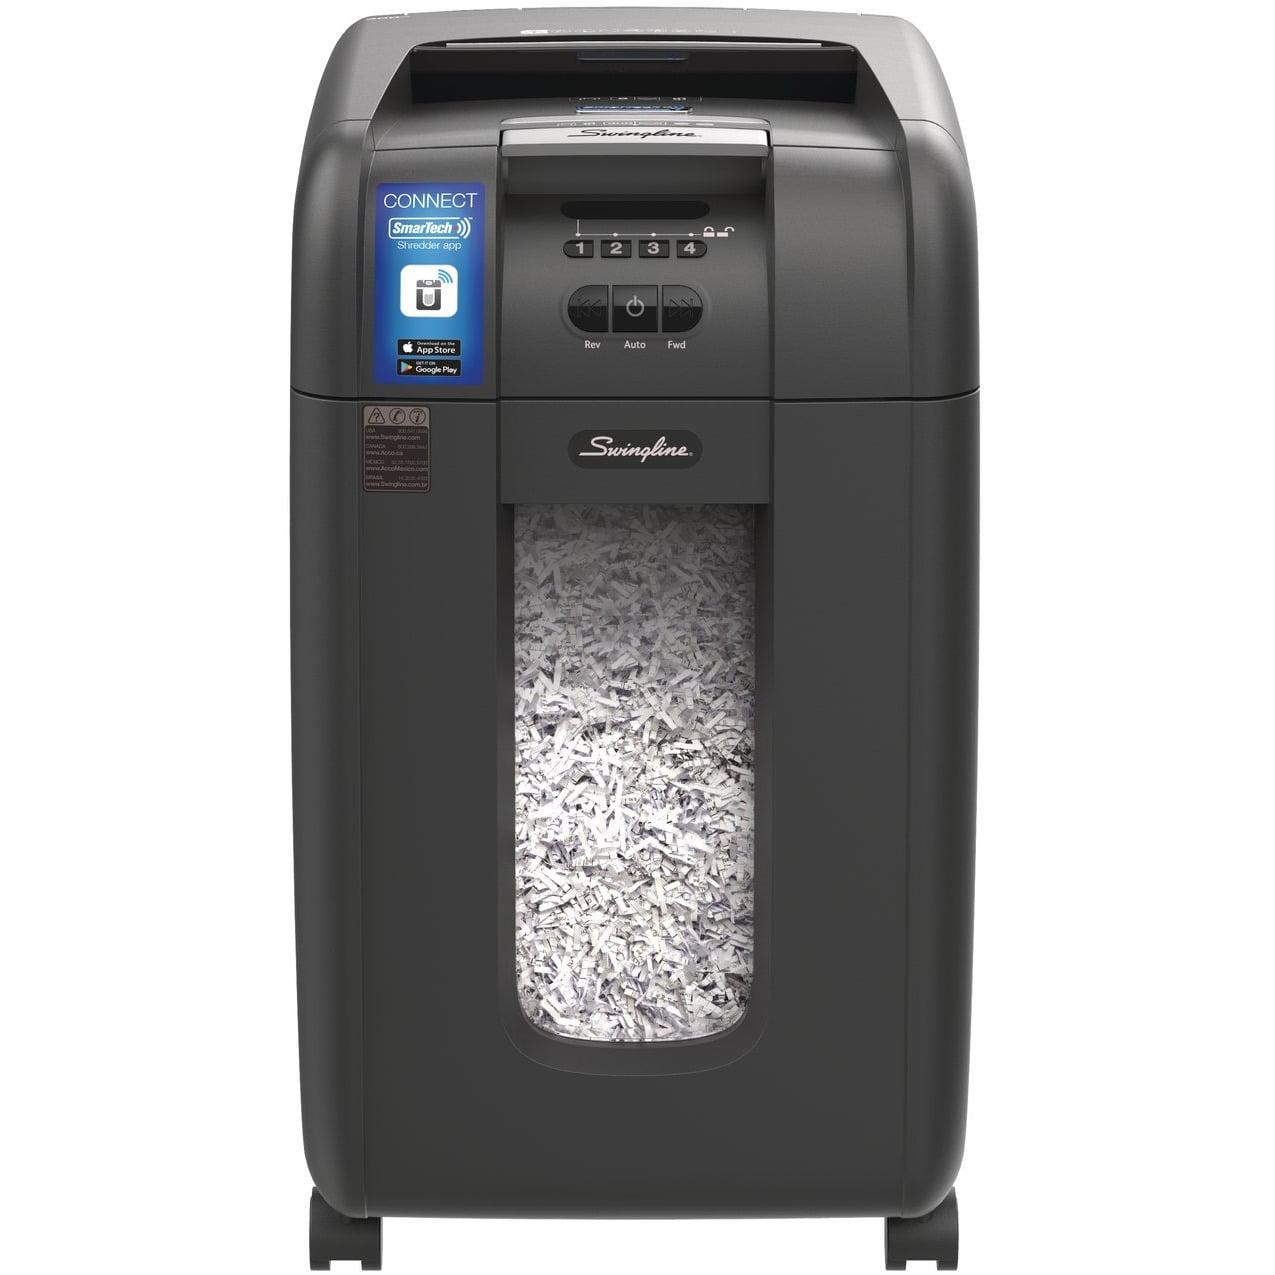 Swingline, SWI1757576, Stack-and-Shred 300X Auto Feed Shredder, 1 Each, Black